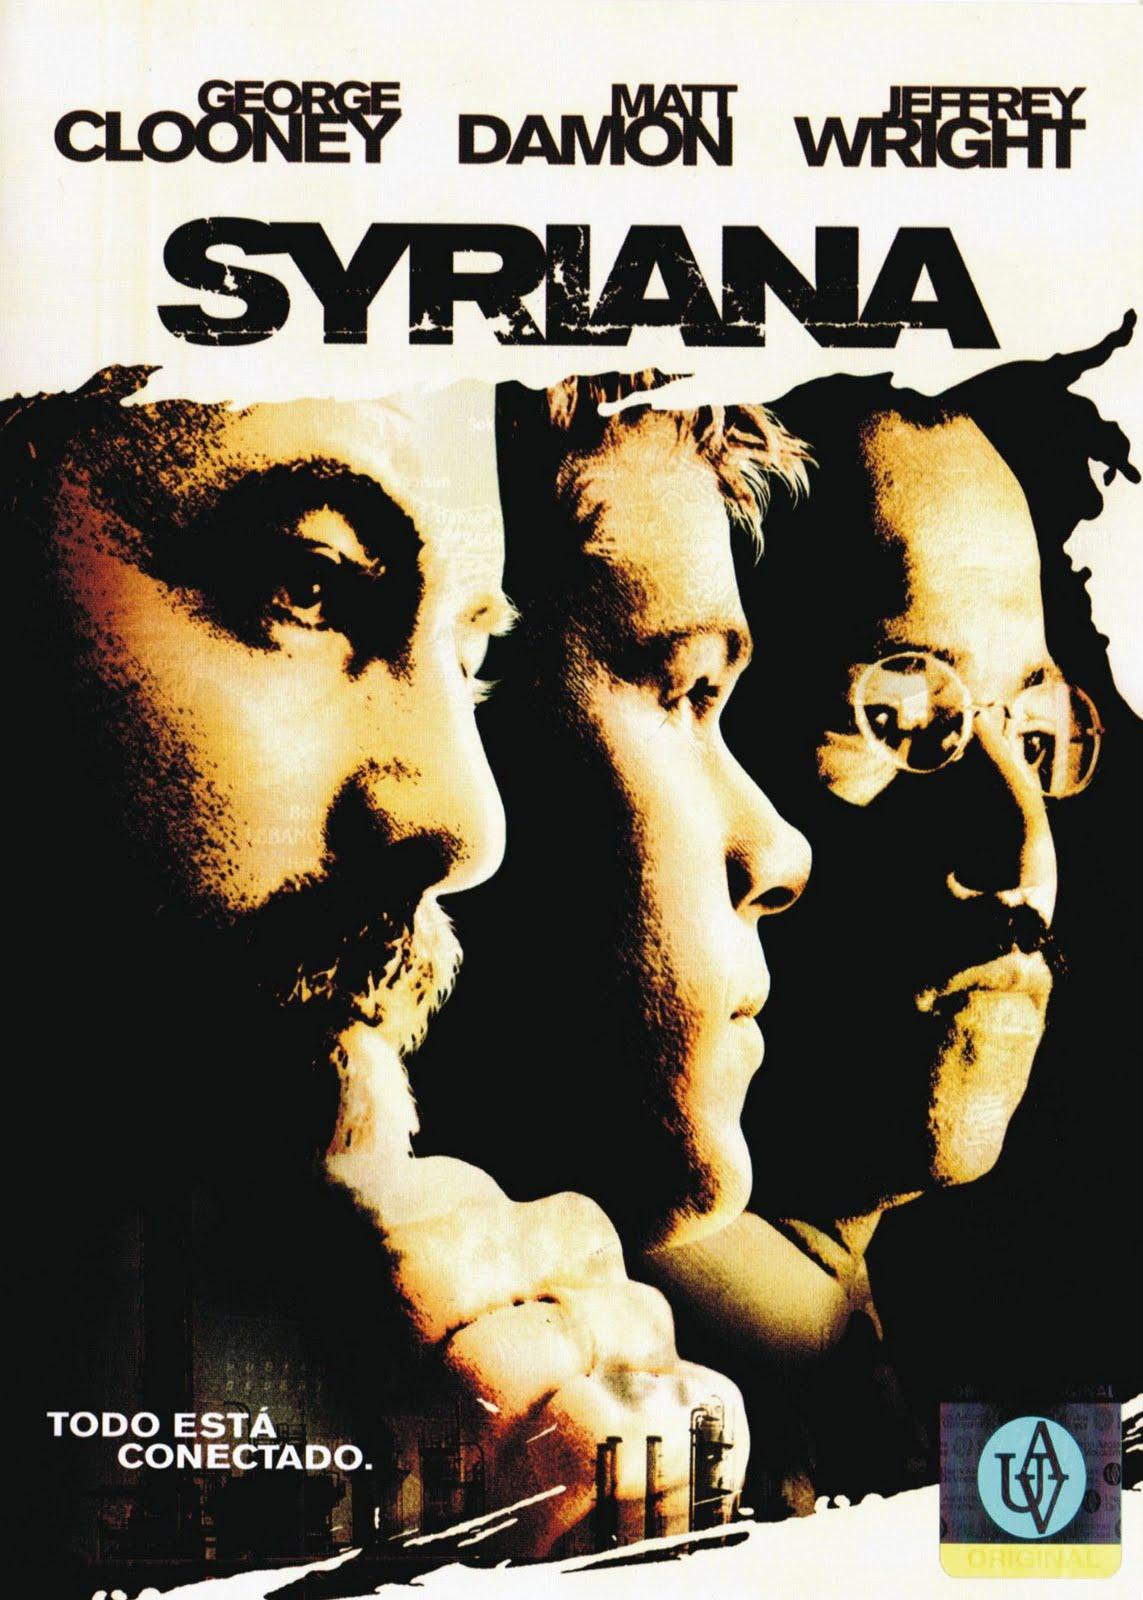 http://1.bp.blogspot.com/-KXqHm47xkZU/Te4WzL3s5YI/AAAAAAAAClE/UEh0U78RUo8/s1600/Syriana.jpg